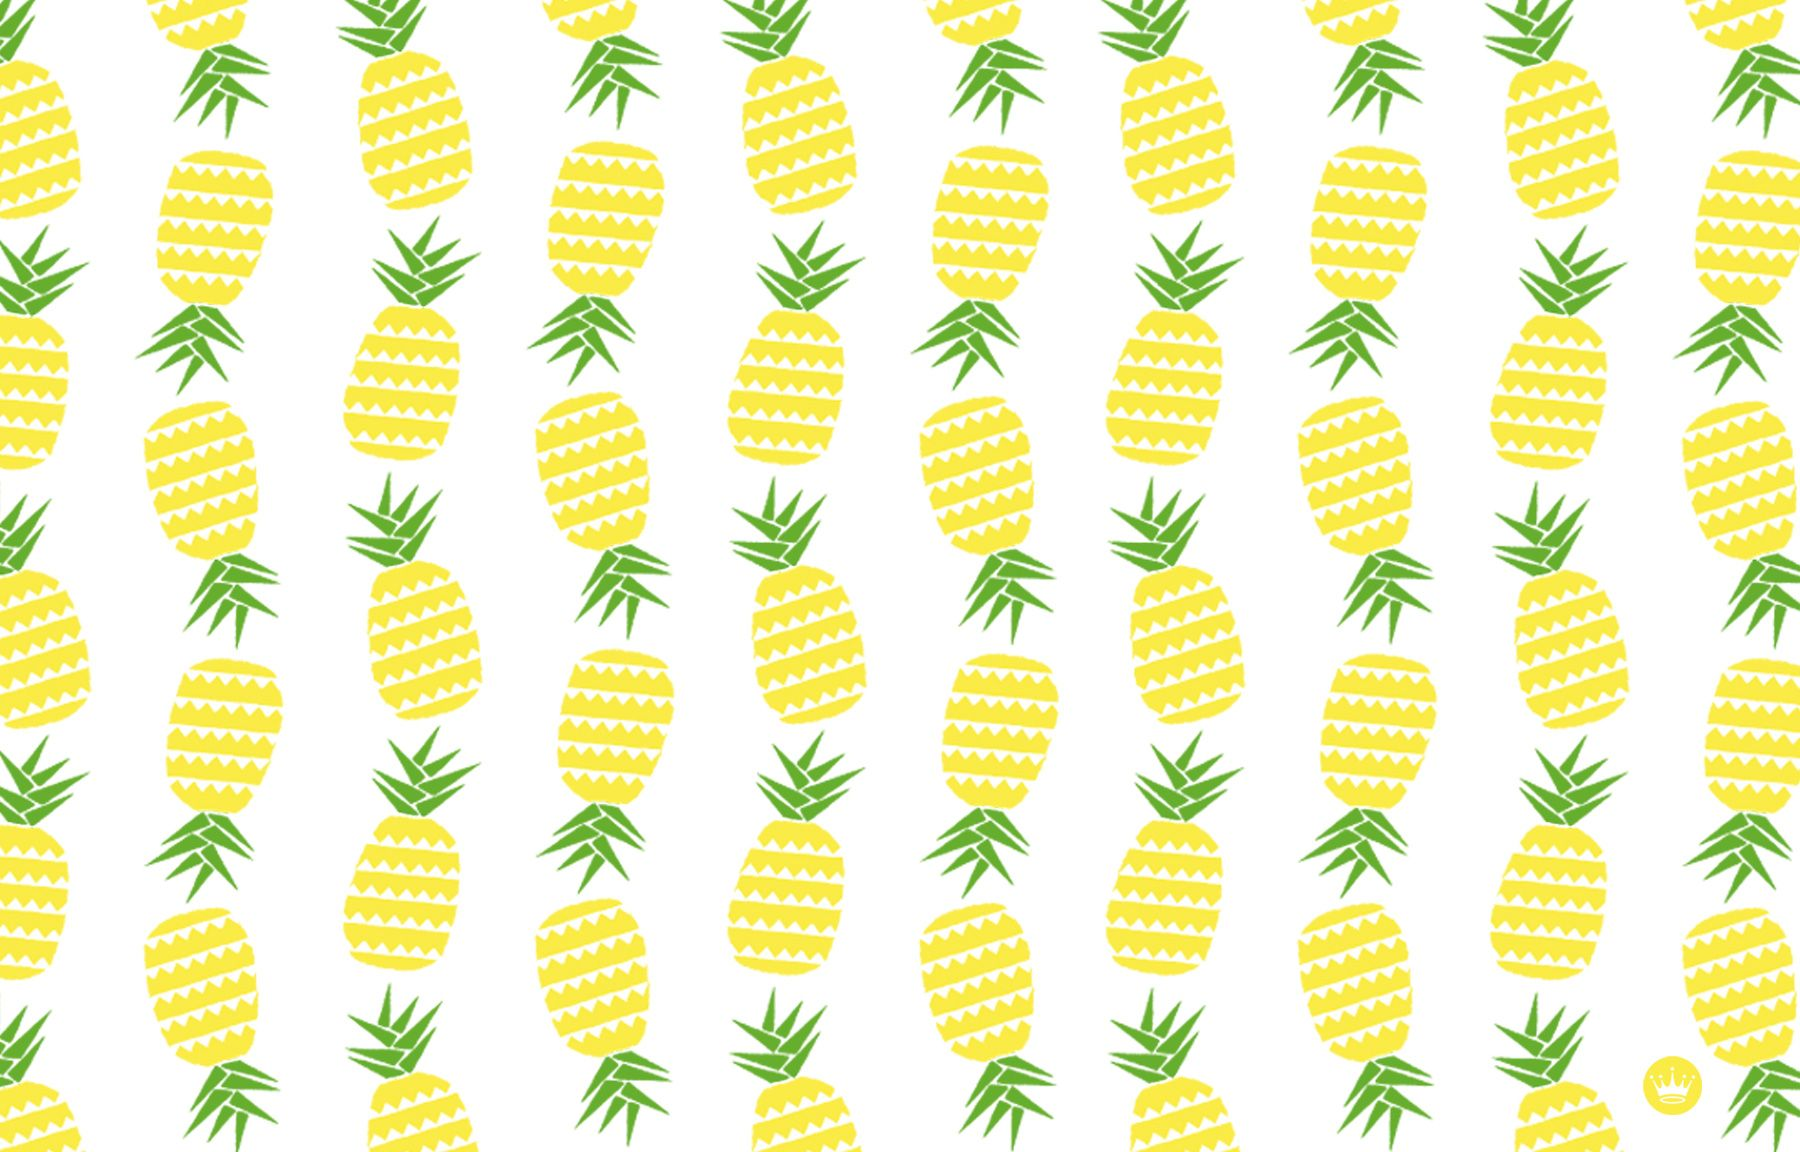 Amazing Wallpaper Mac Pineapple - c22cc27407fde5b4d2efe223d715e661  You Should Have_45895.jpg